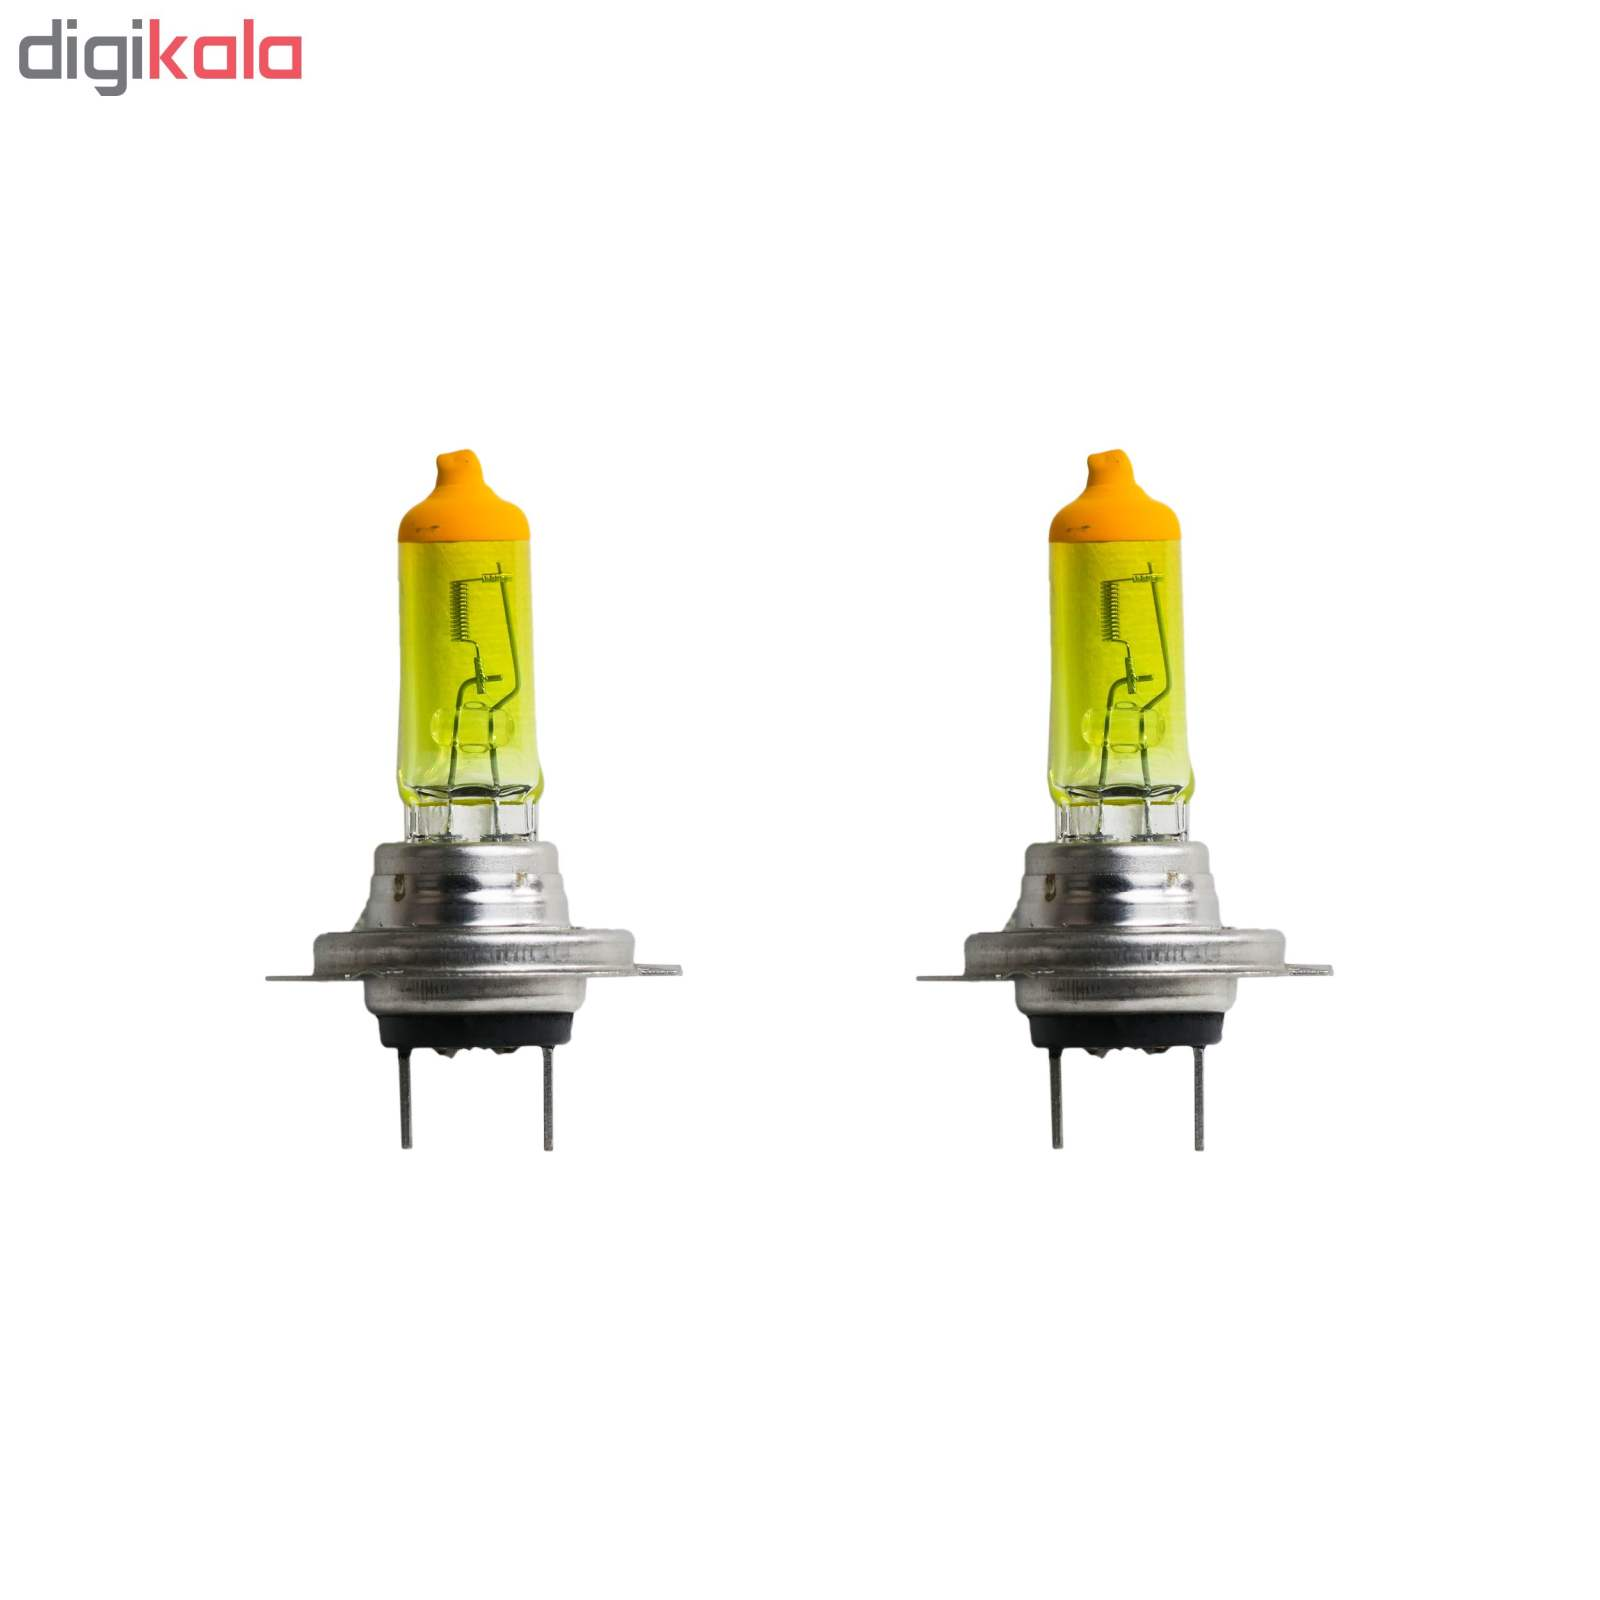 لامپ هالوژن خودرو مدل YH07CL بسته دو عددی main 1 1